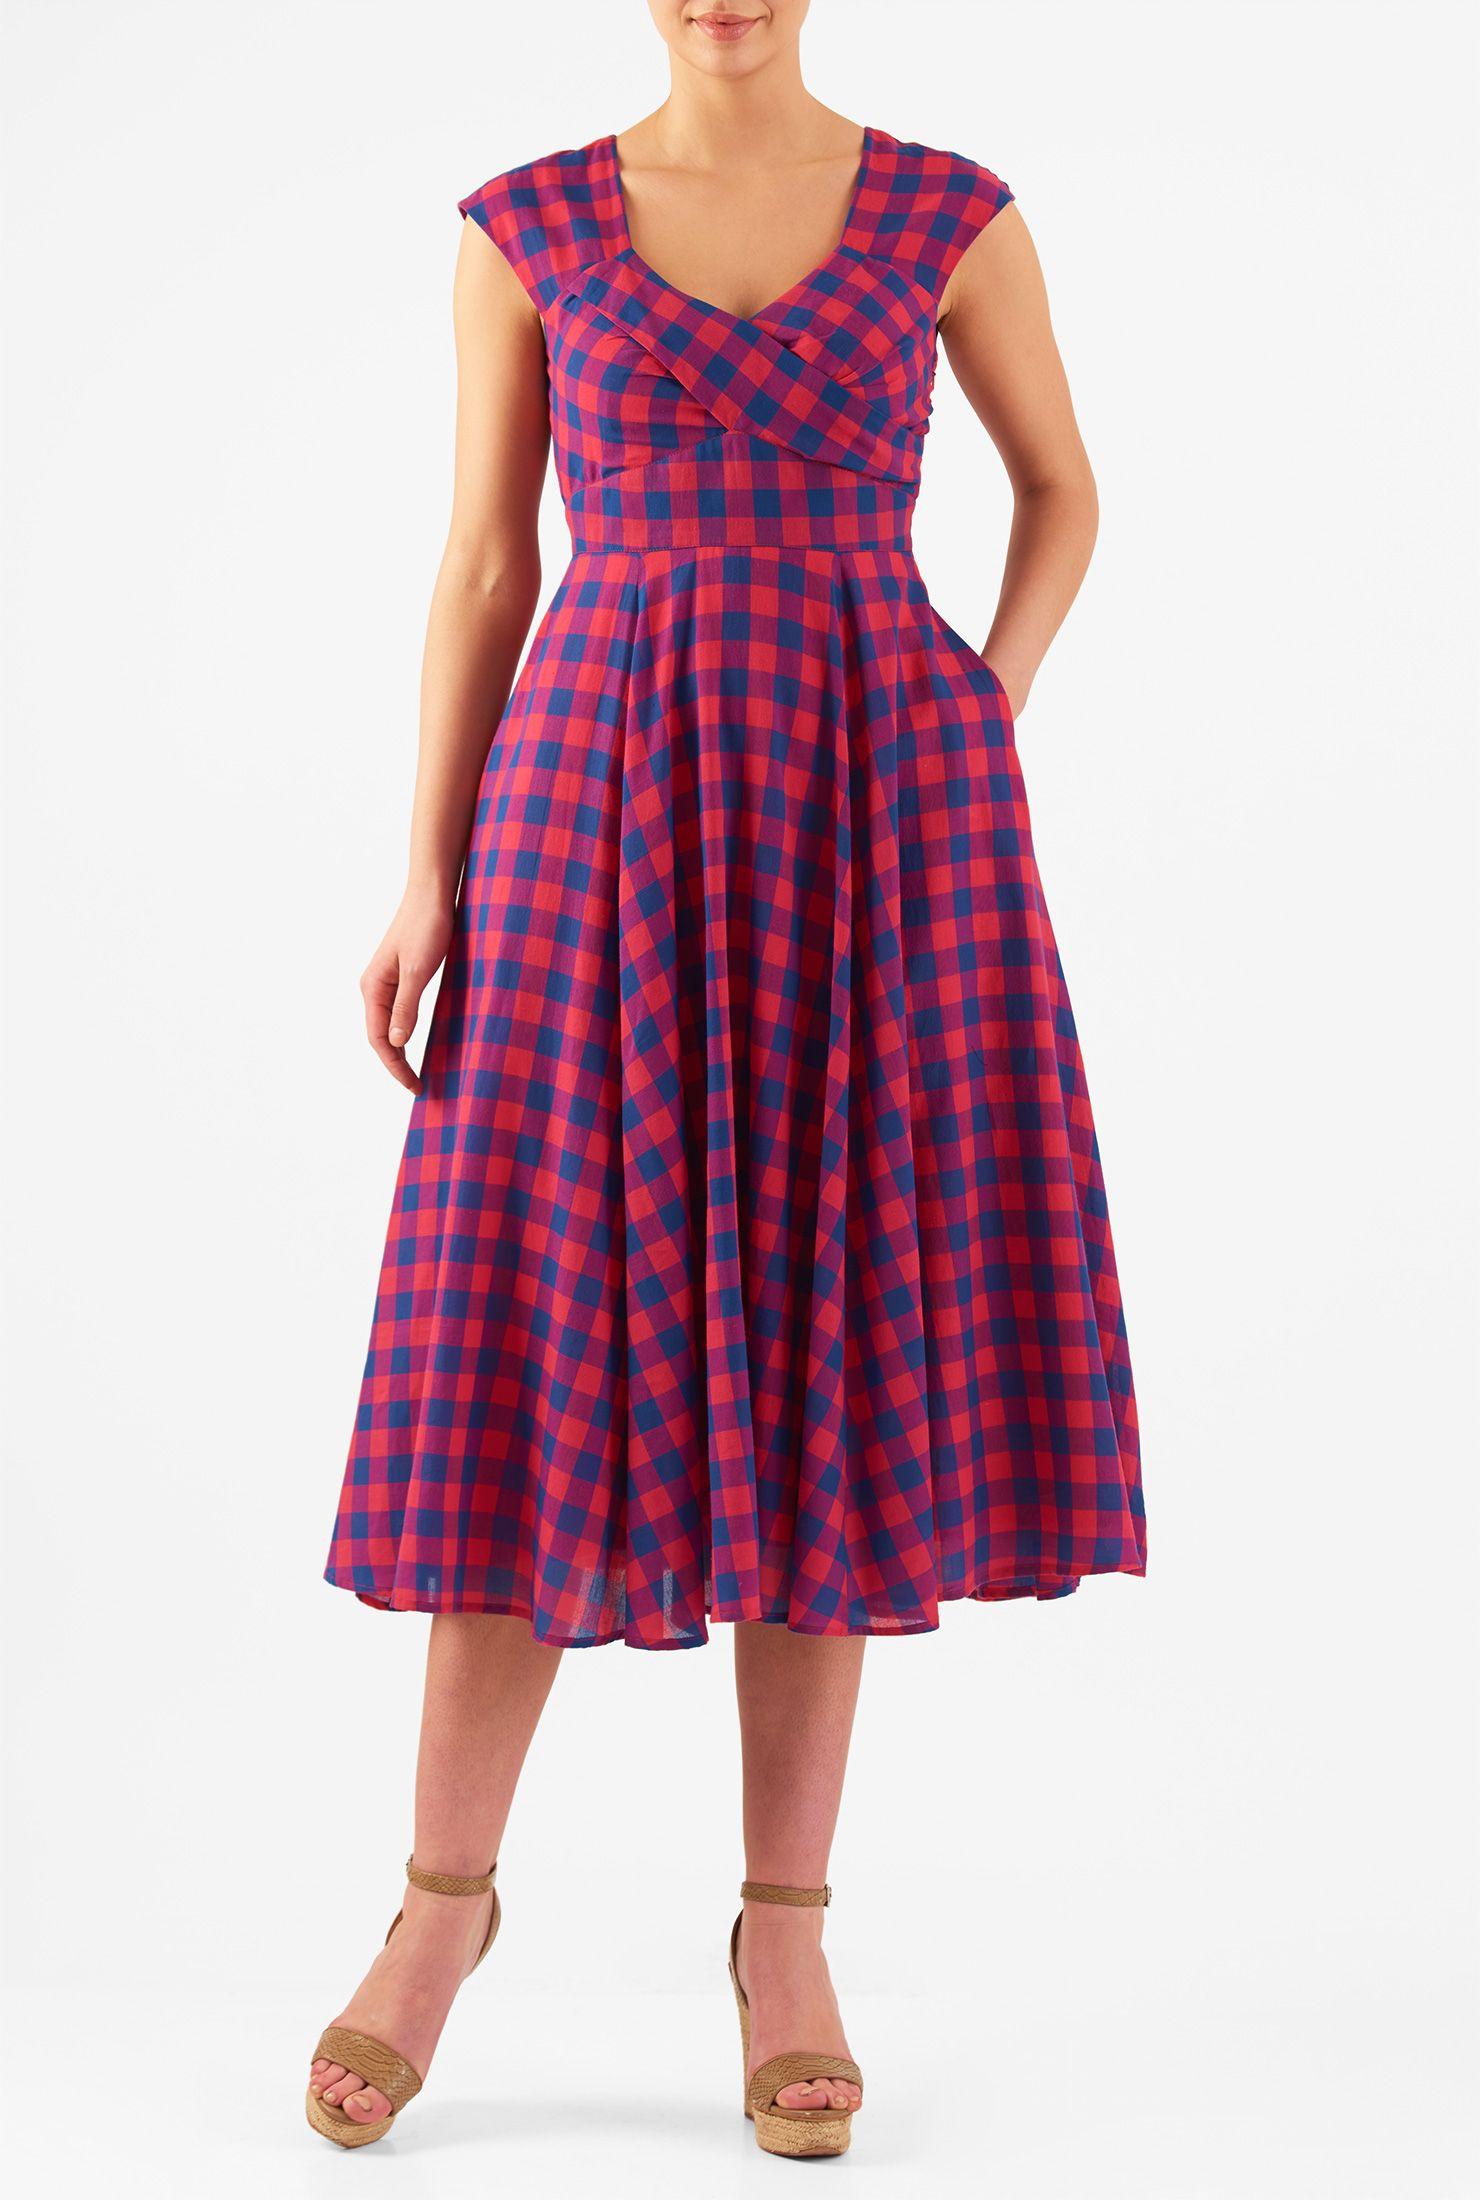 Cotton check corset-style dress